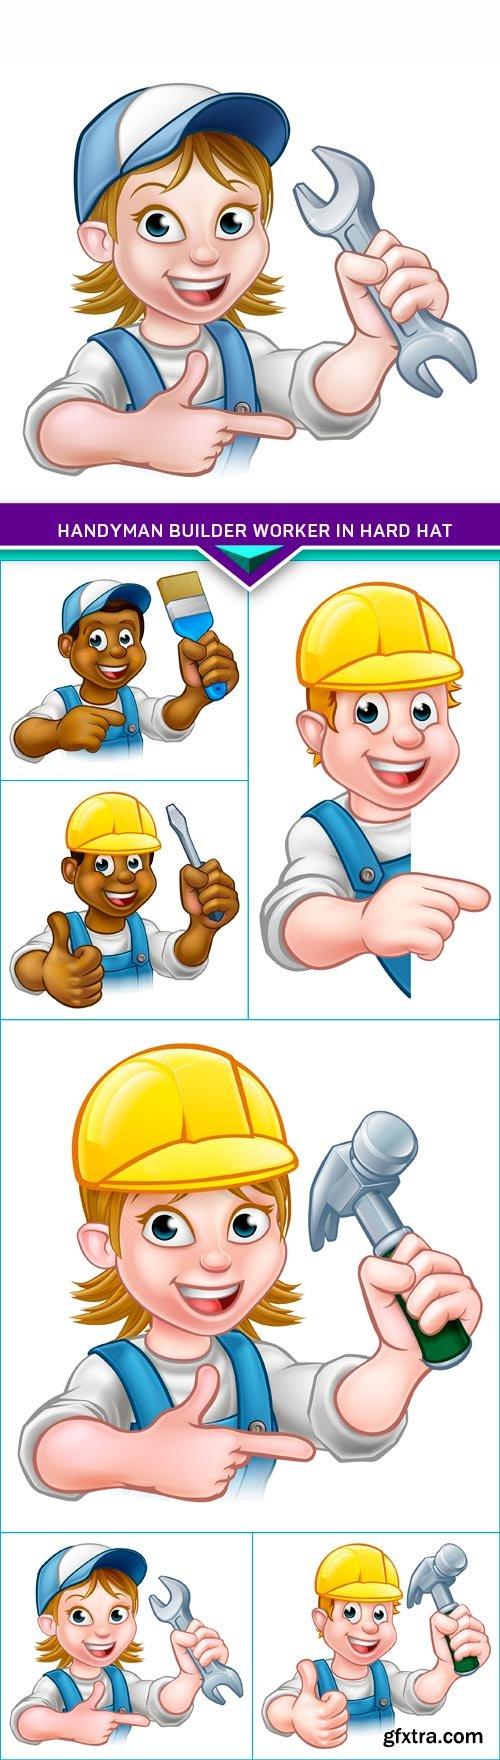 Handyman Builder Worker in Hard Hat 6X EPS